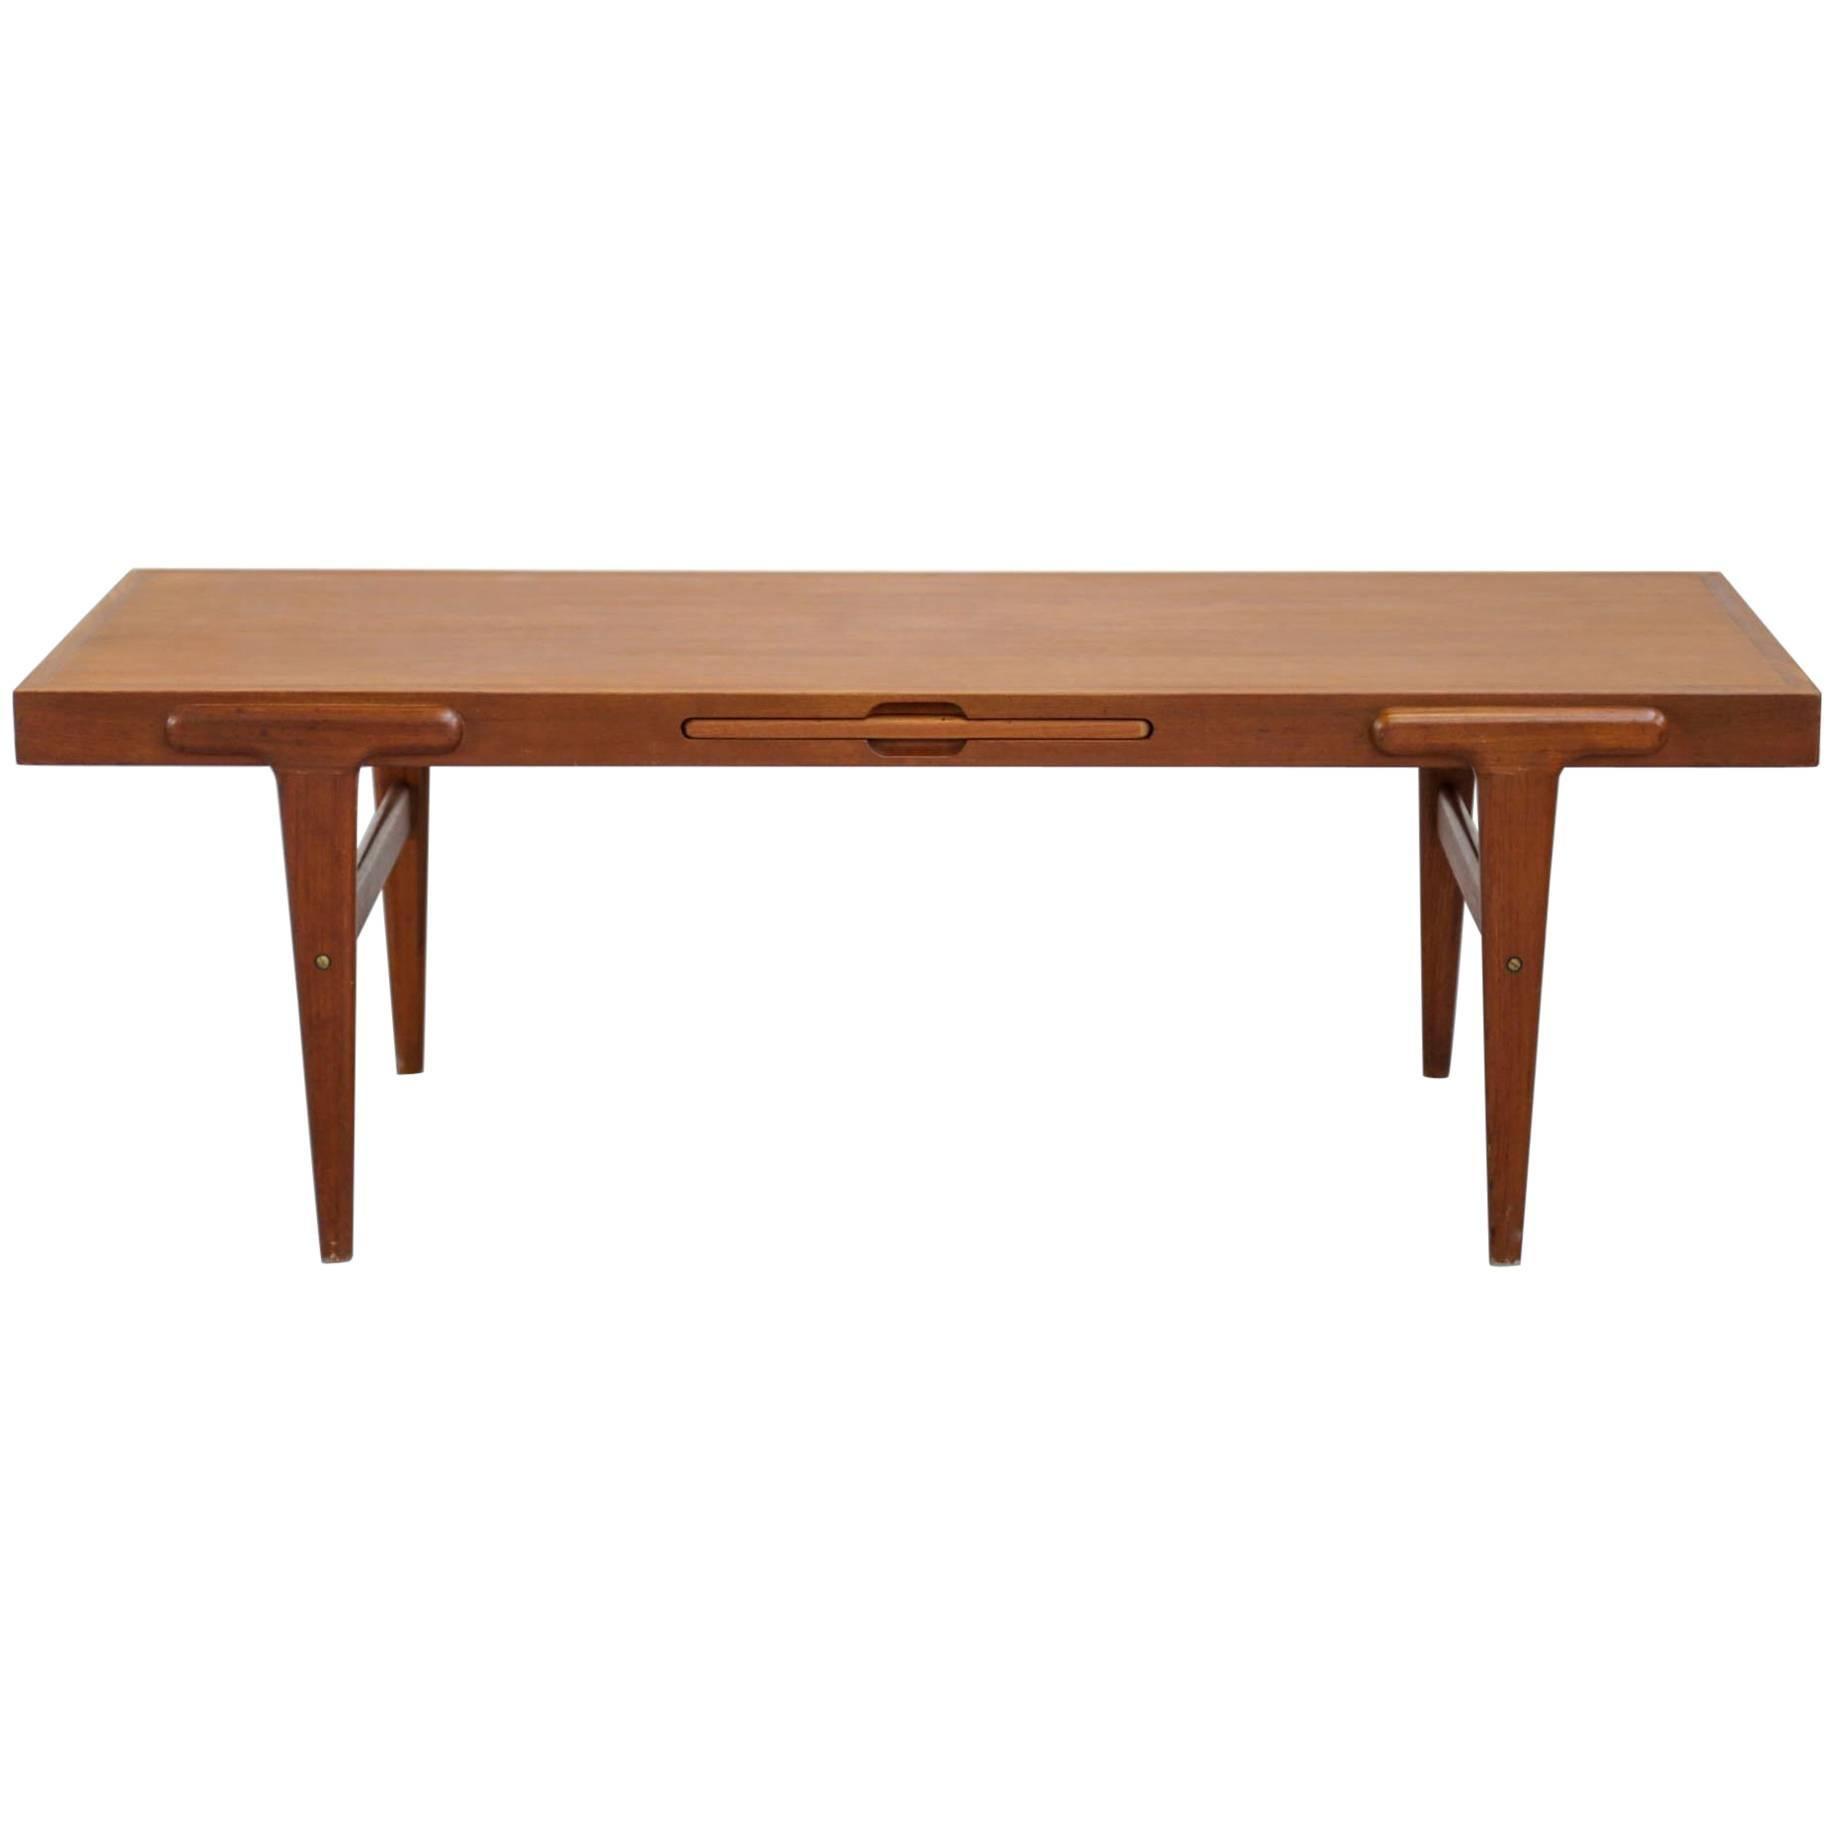 Large Coffee or Sofa Table Johannes Andersen